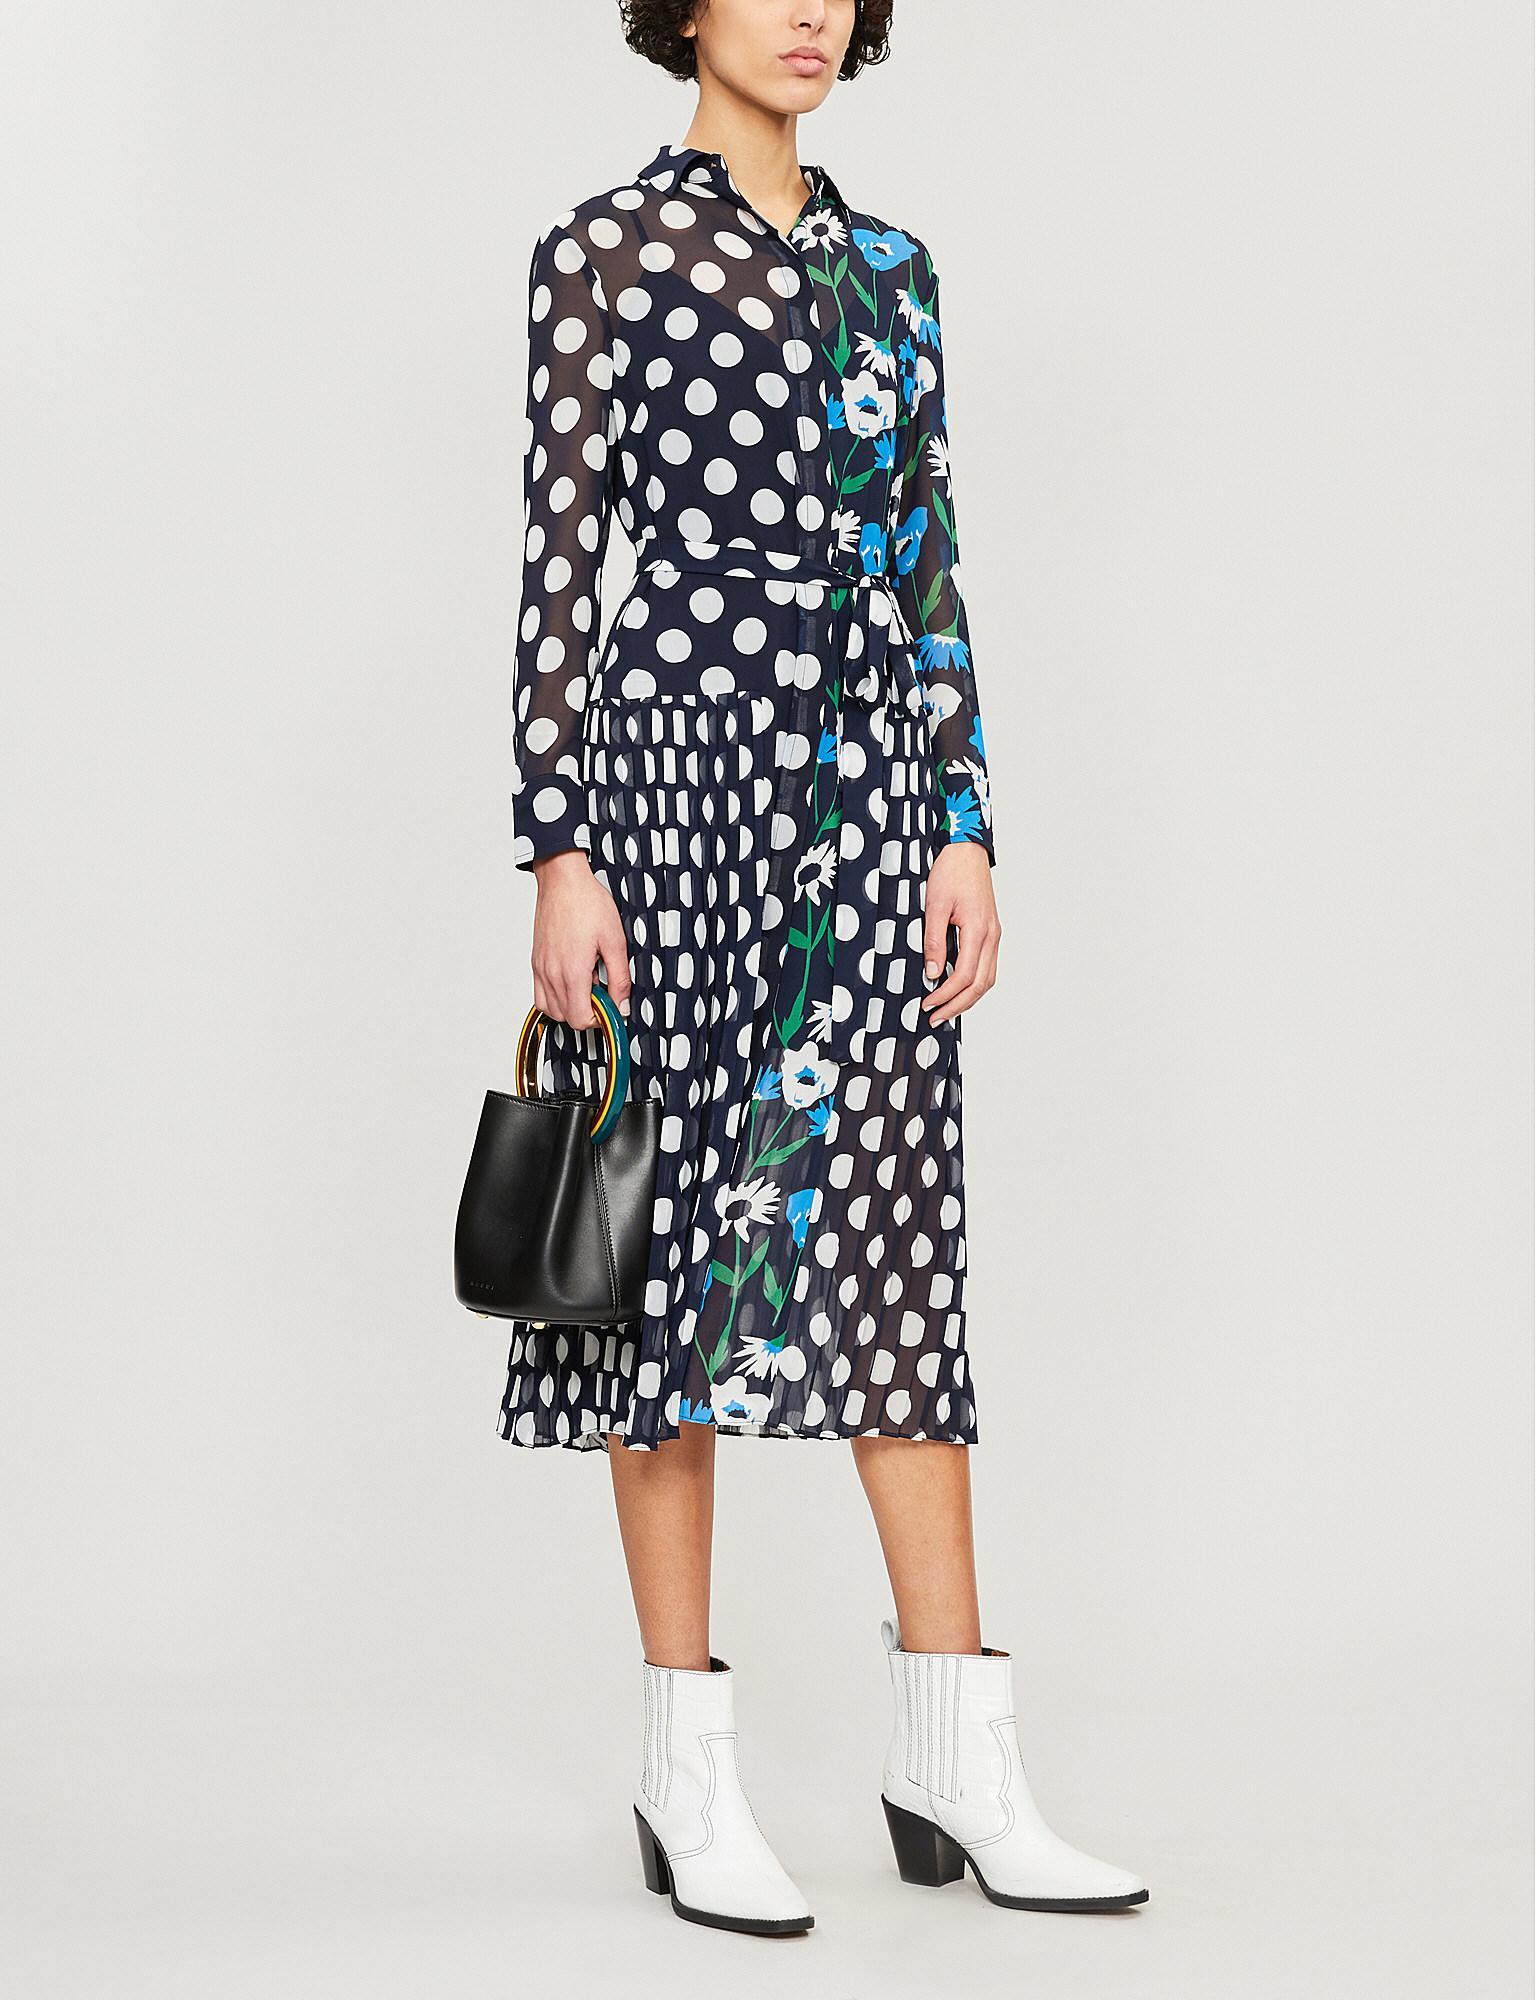 d6215984c8 Kitri Gabriella Polka Dot And Floral-print Crepe Dress in Blue - Lyst